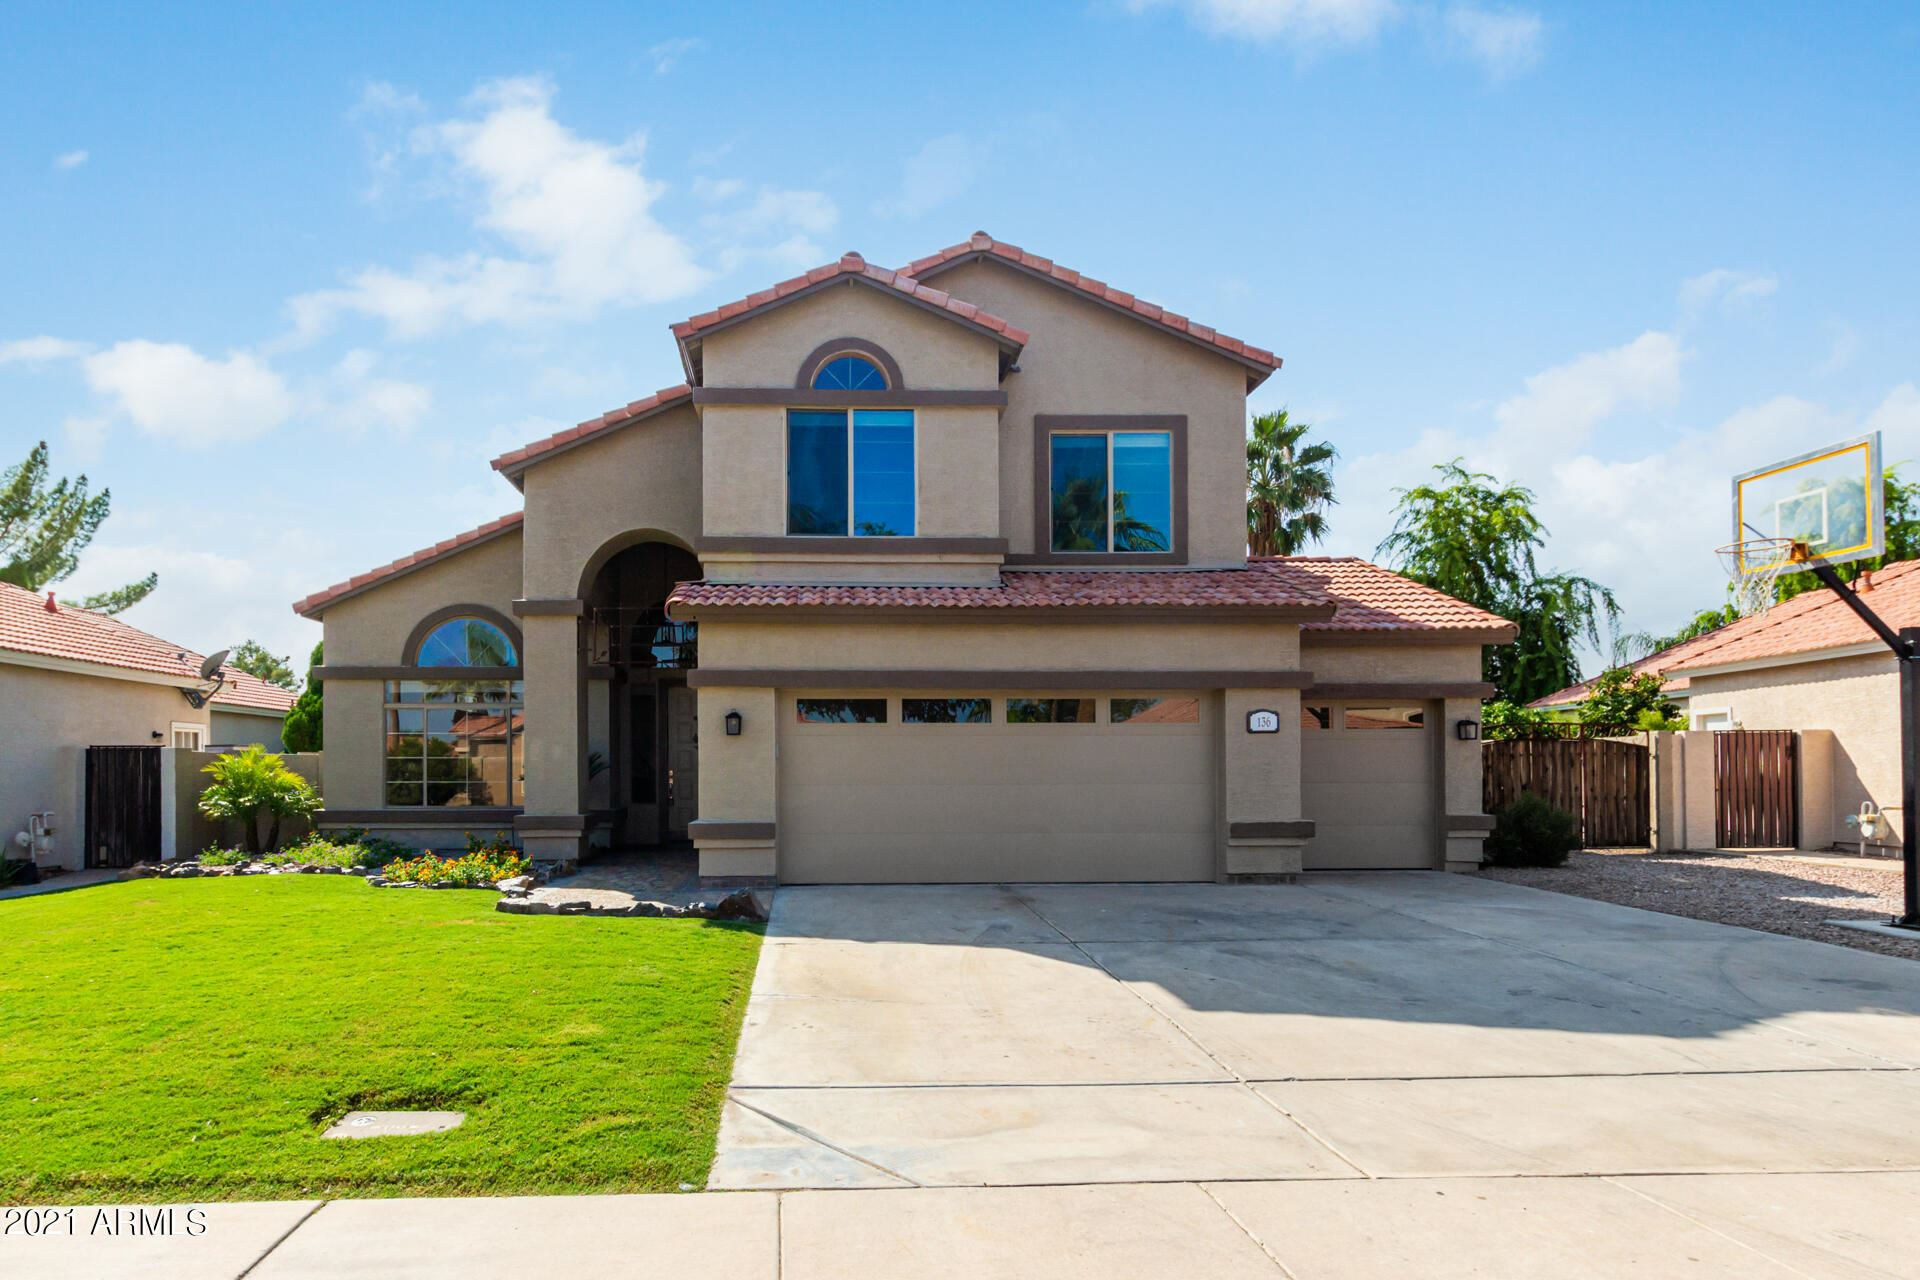 Photo of 136 N STARBOARD Drive, Gilbert, AZ 85234 (MLS # 6295652)